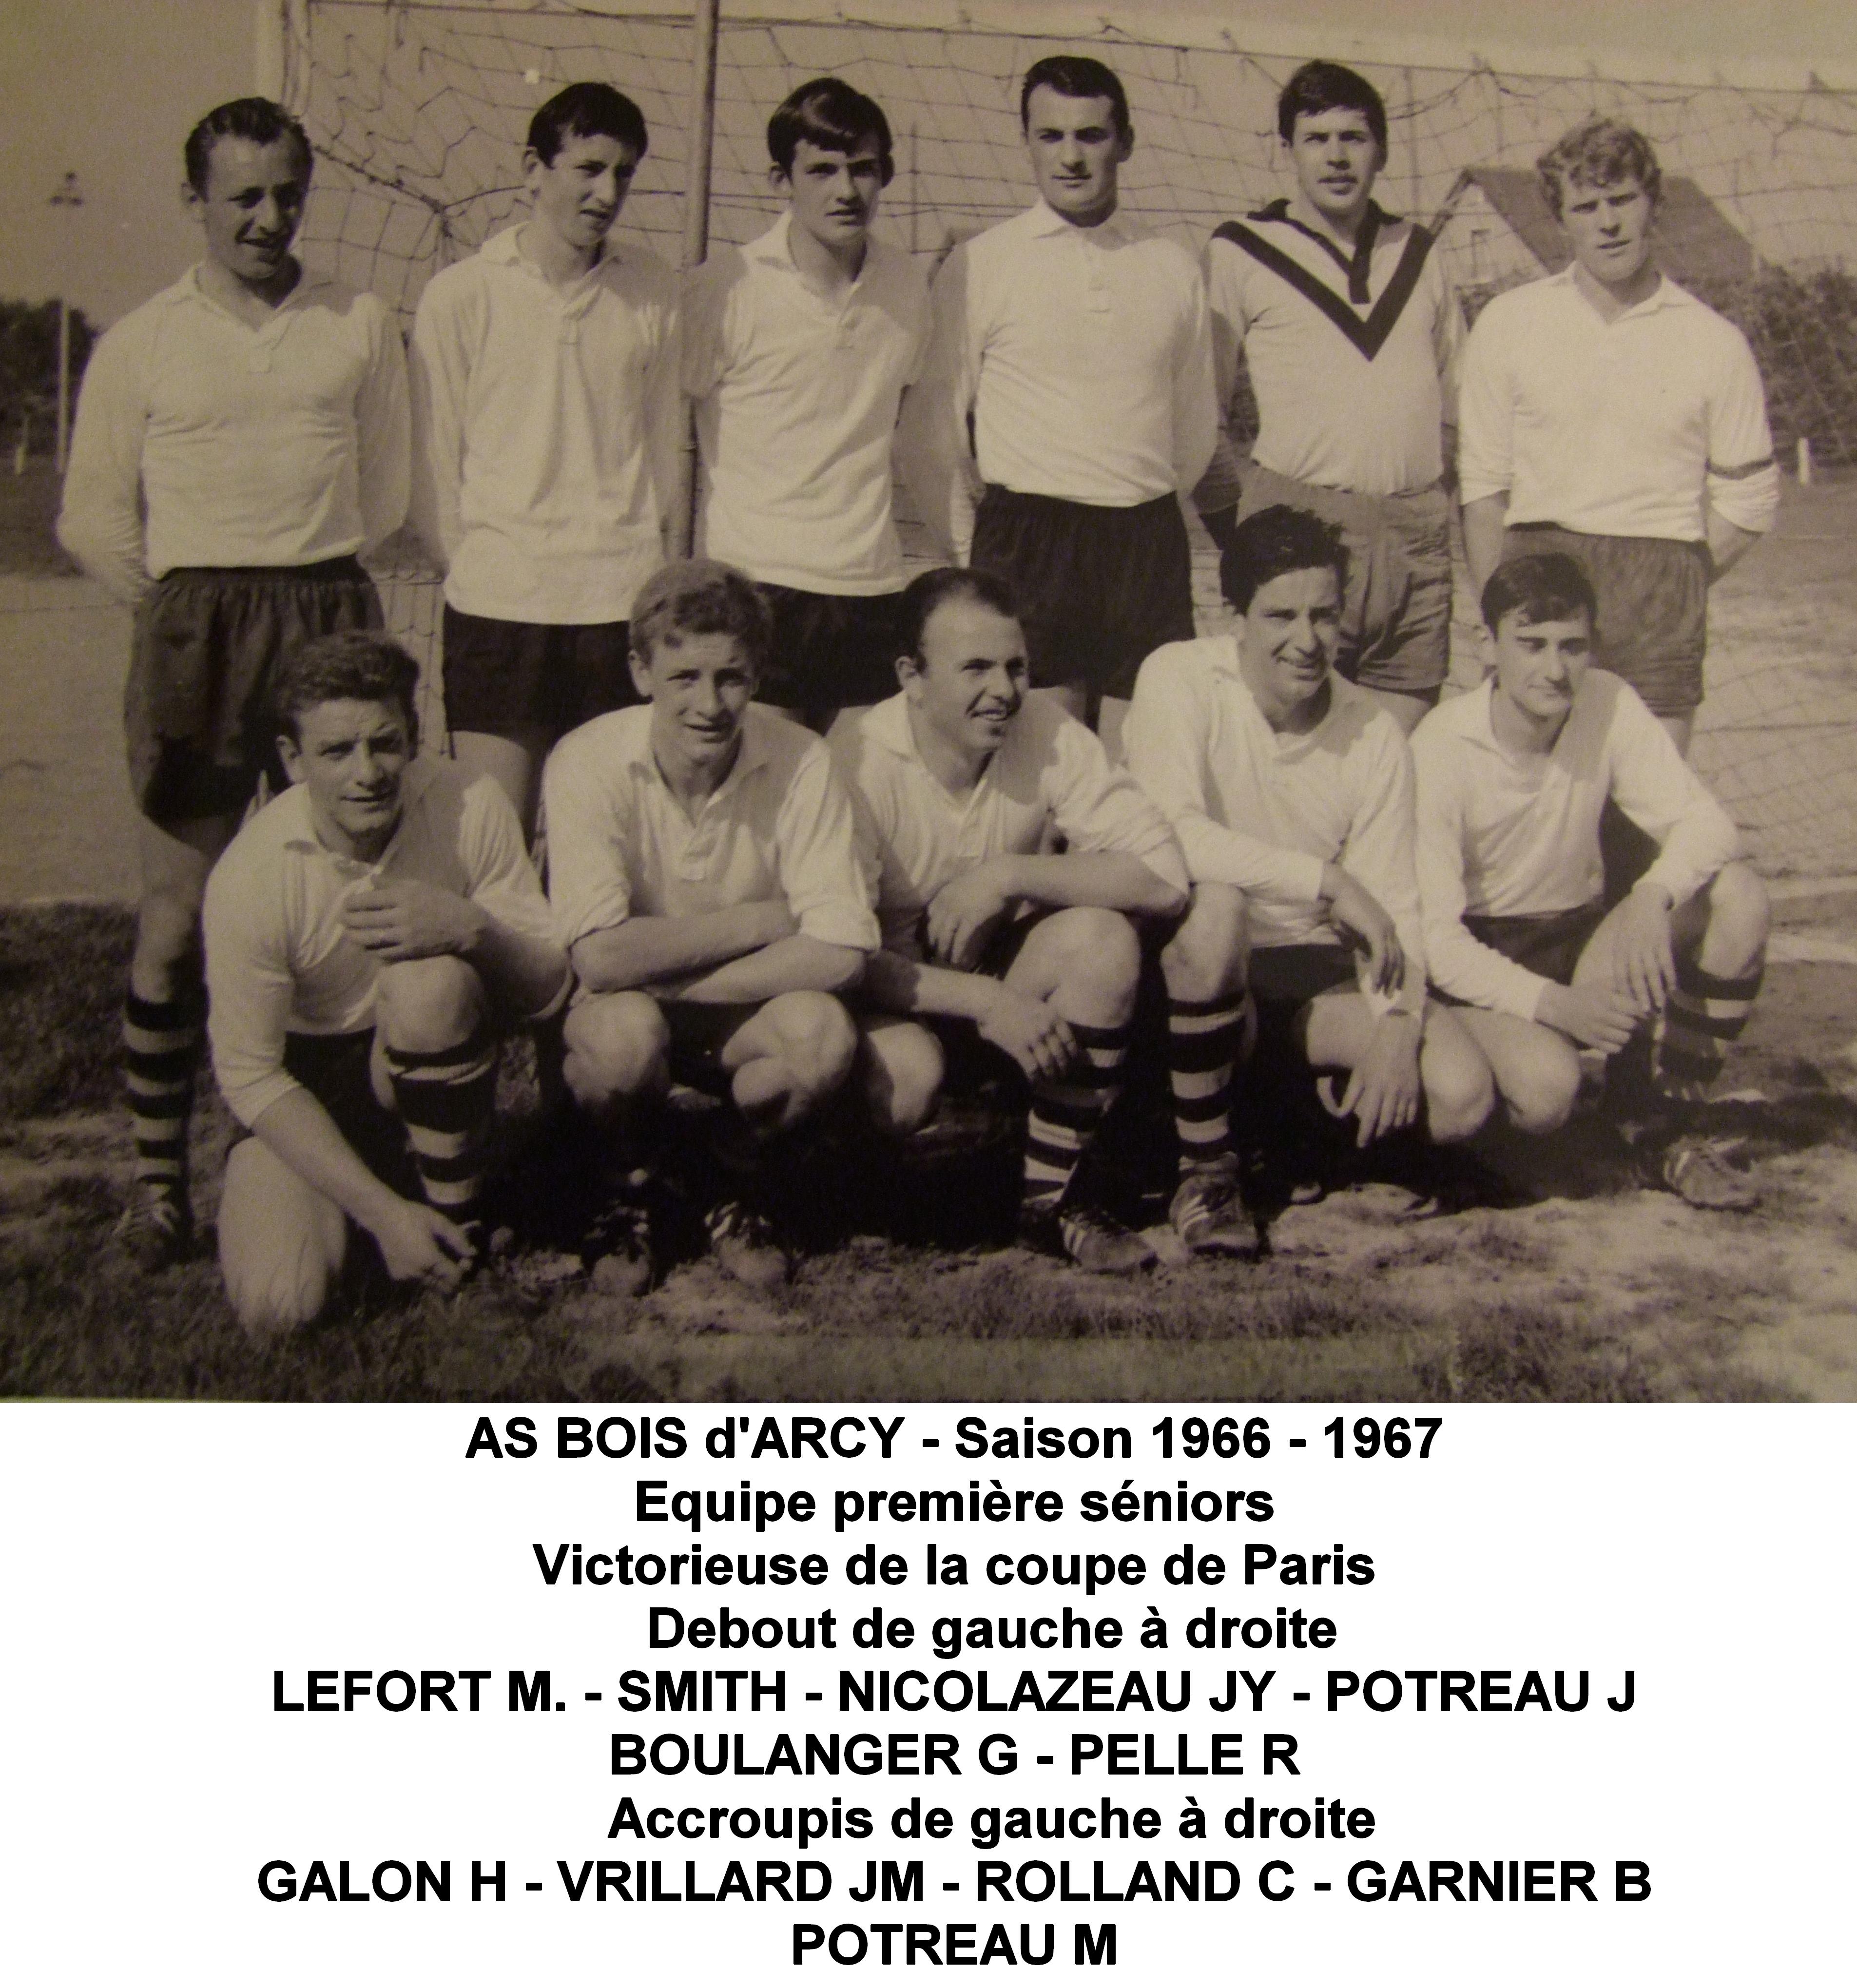 http://staff.footeo.com/uploads/asbafoot78/Medias/1966.jpg